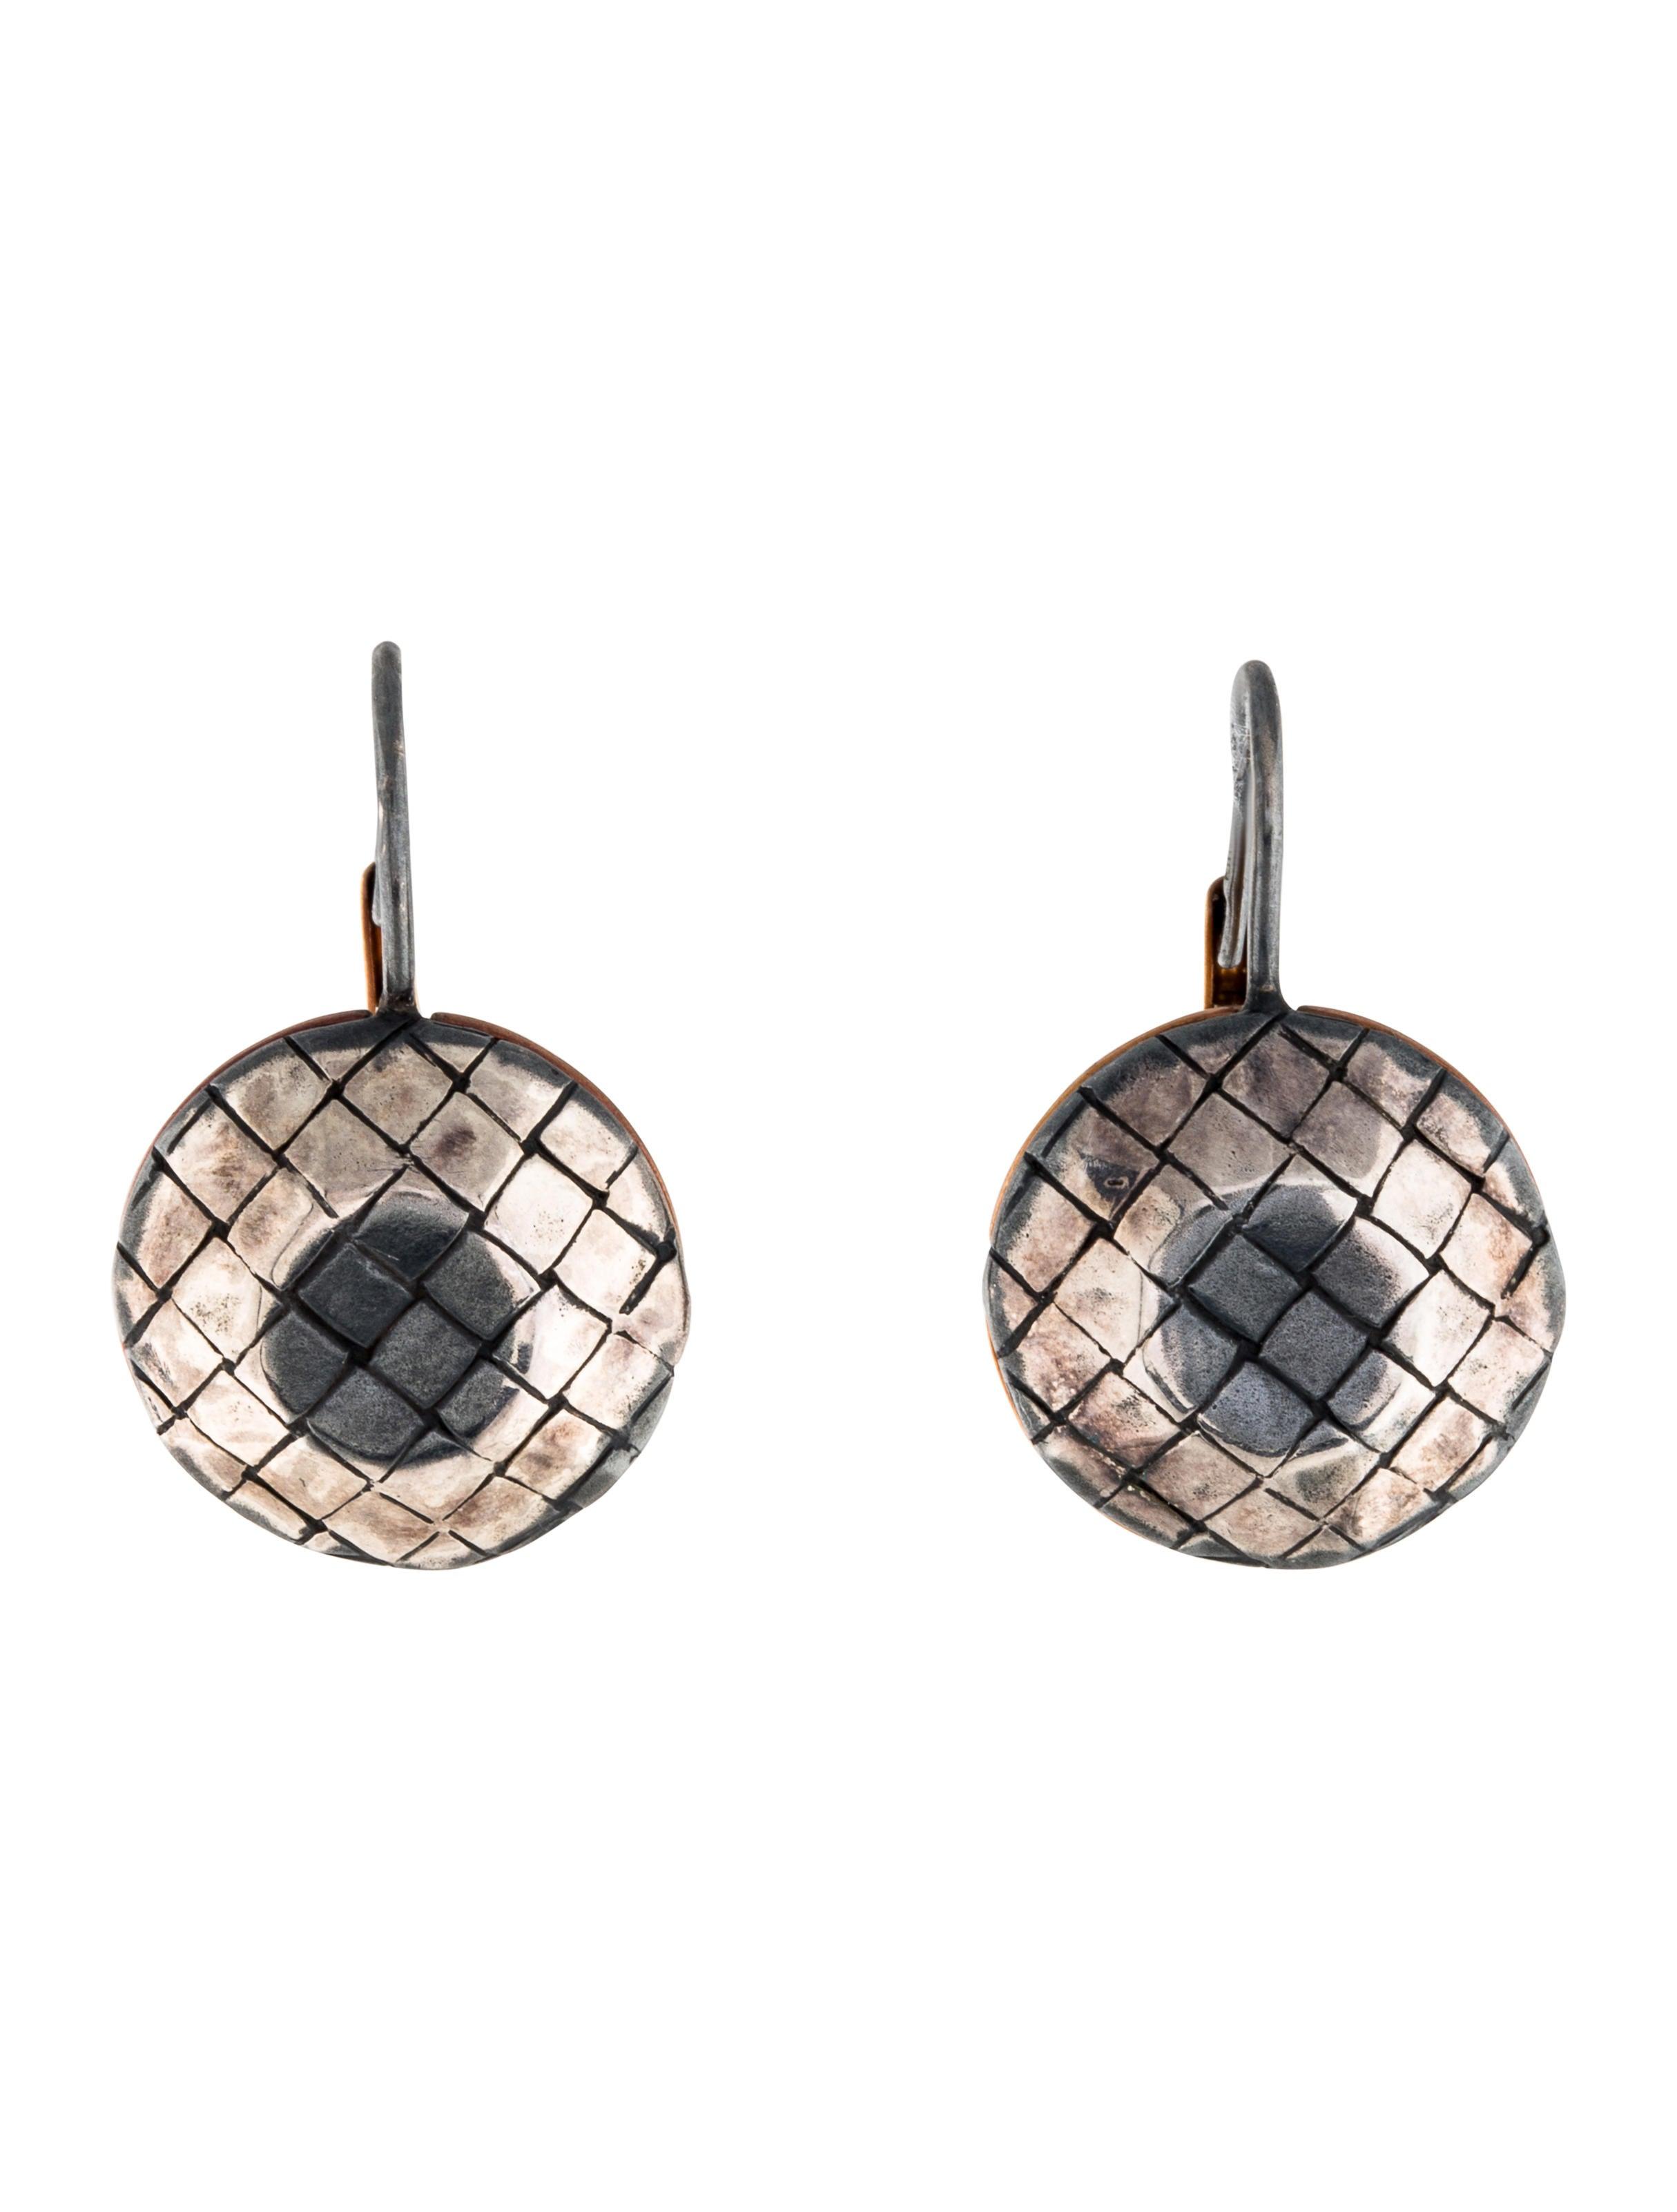 Bottega Veneta Intrecciato drop earrings gnhbHj4oM0